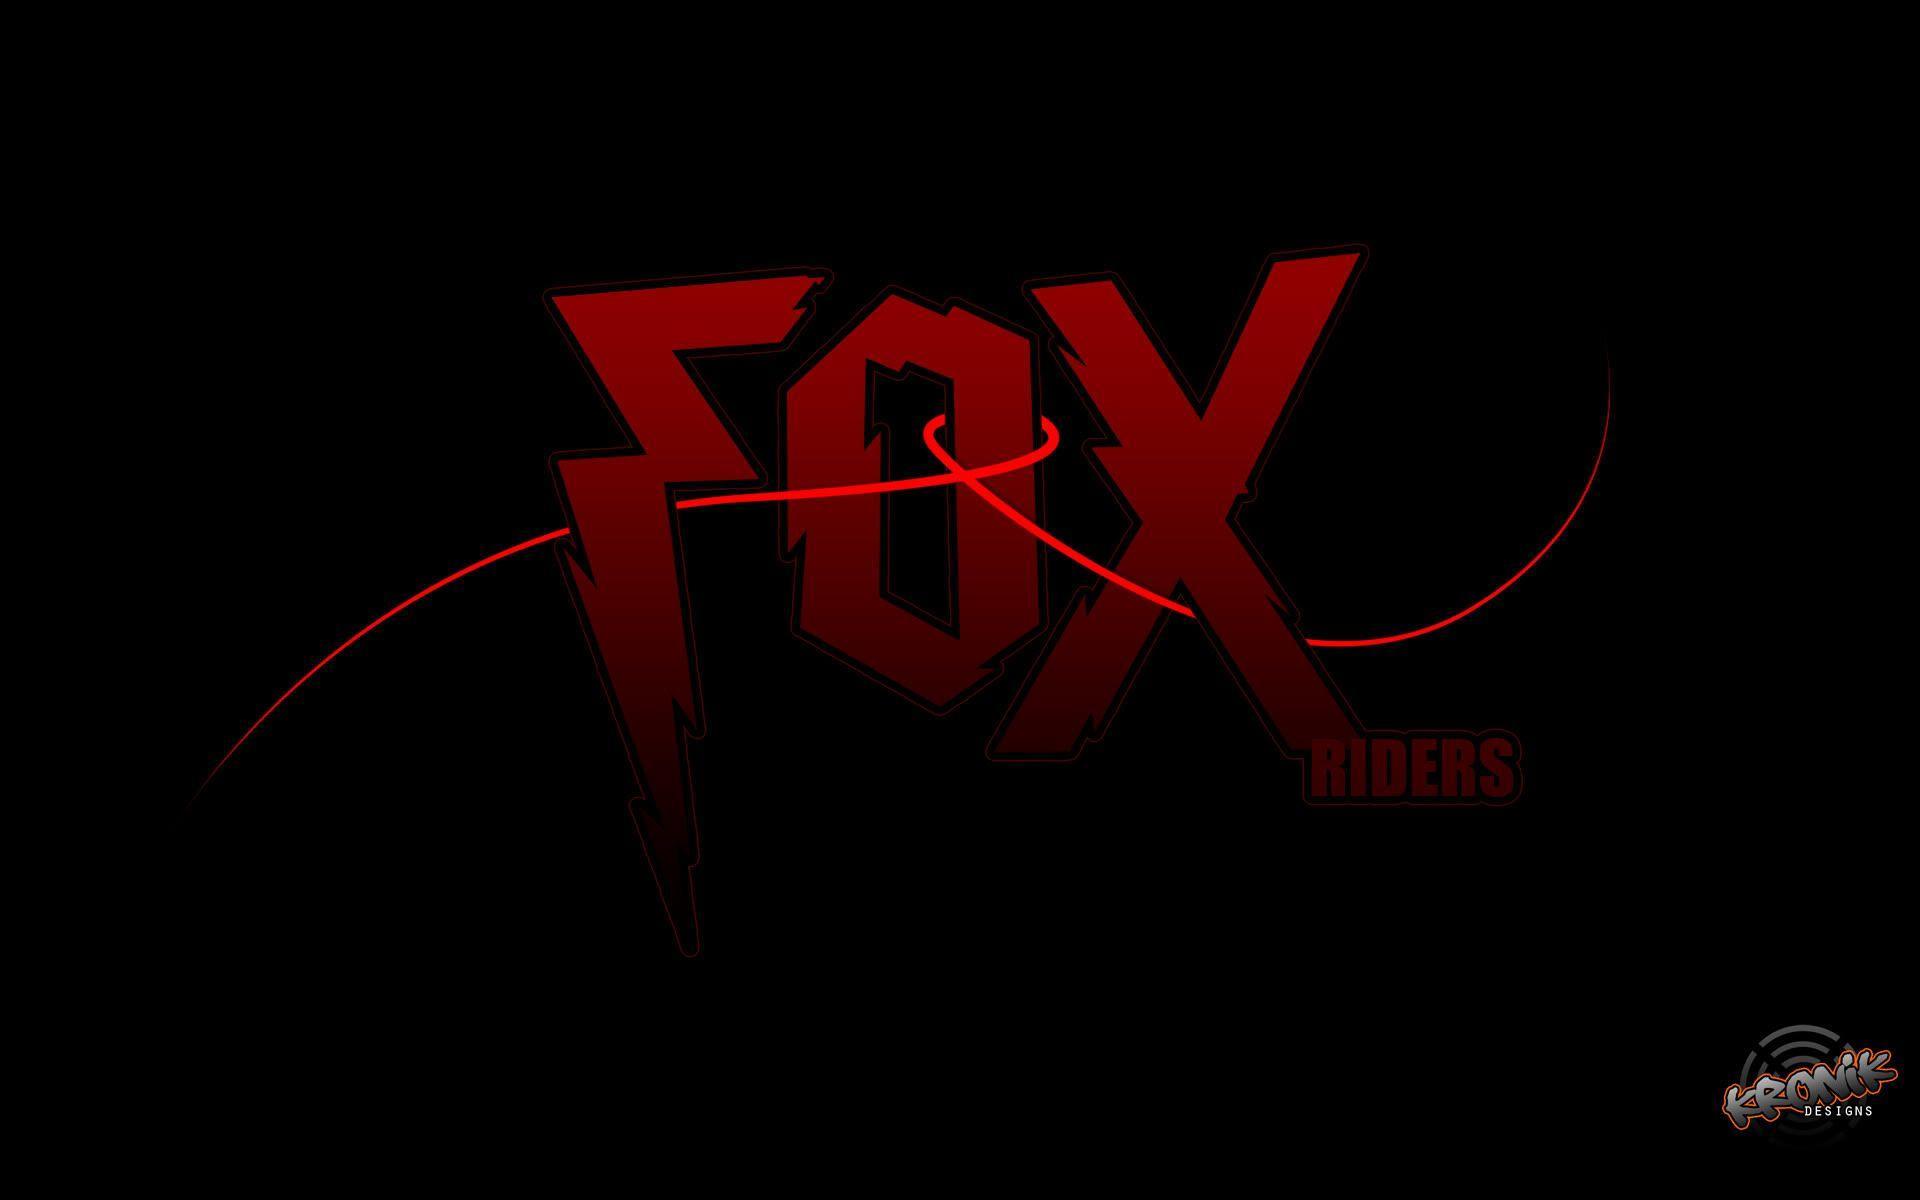 Fox Racing Backgrounds 1920x1200